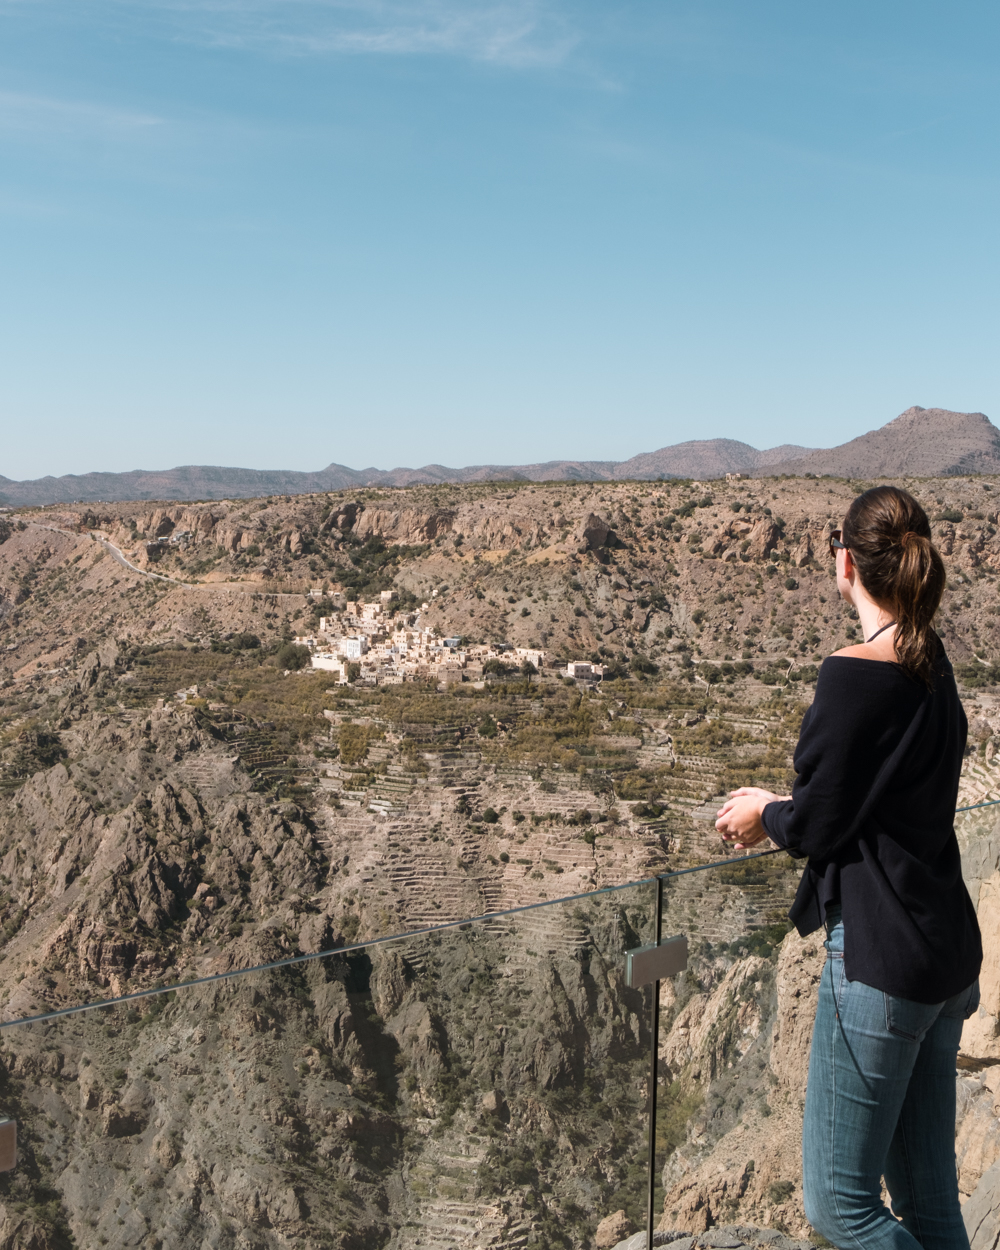 Oman Itinerary - Jabel Akhdar - Anantara - Diana's point - Places to visit in Oman